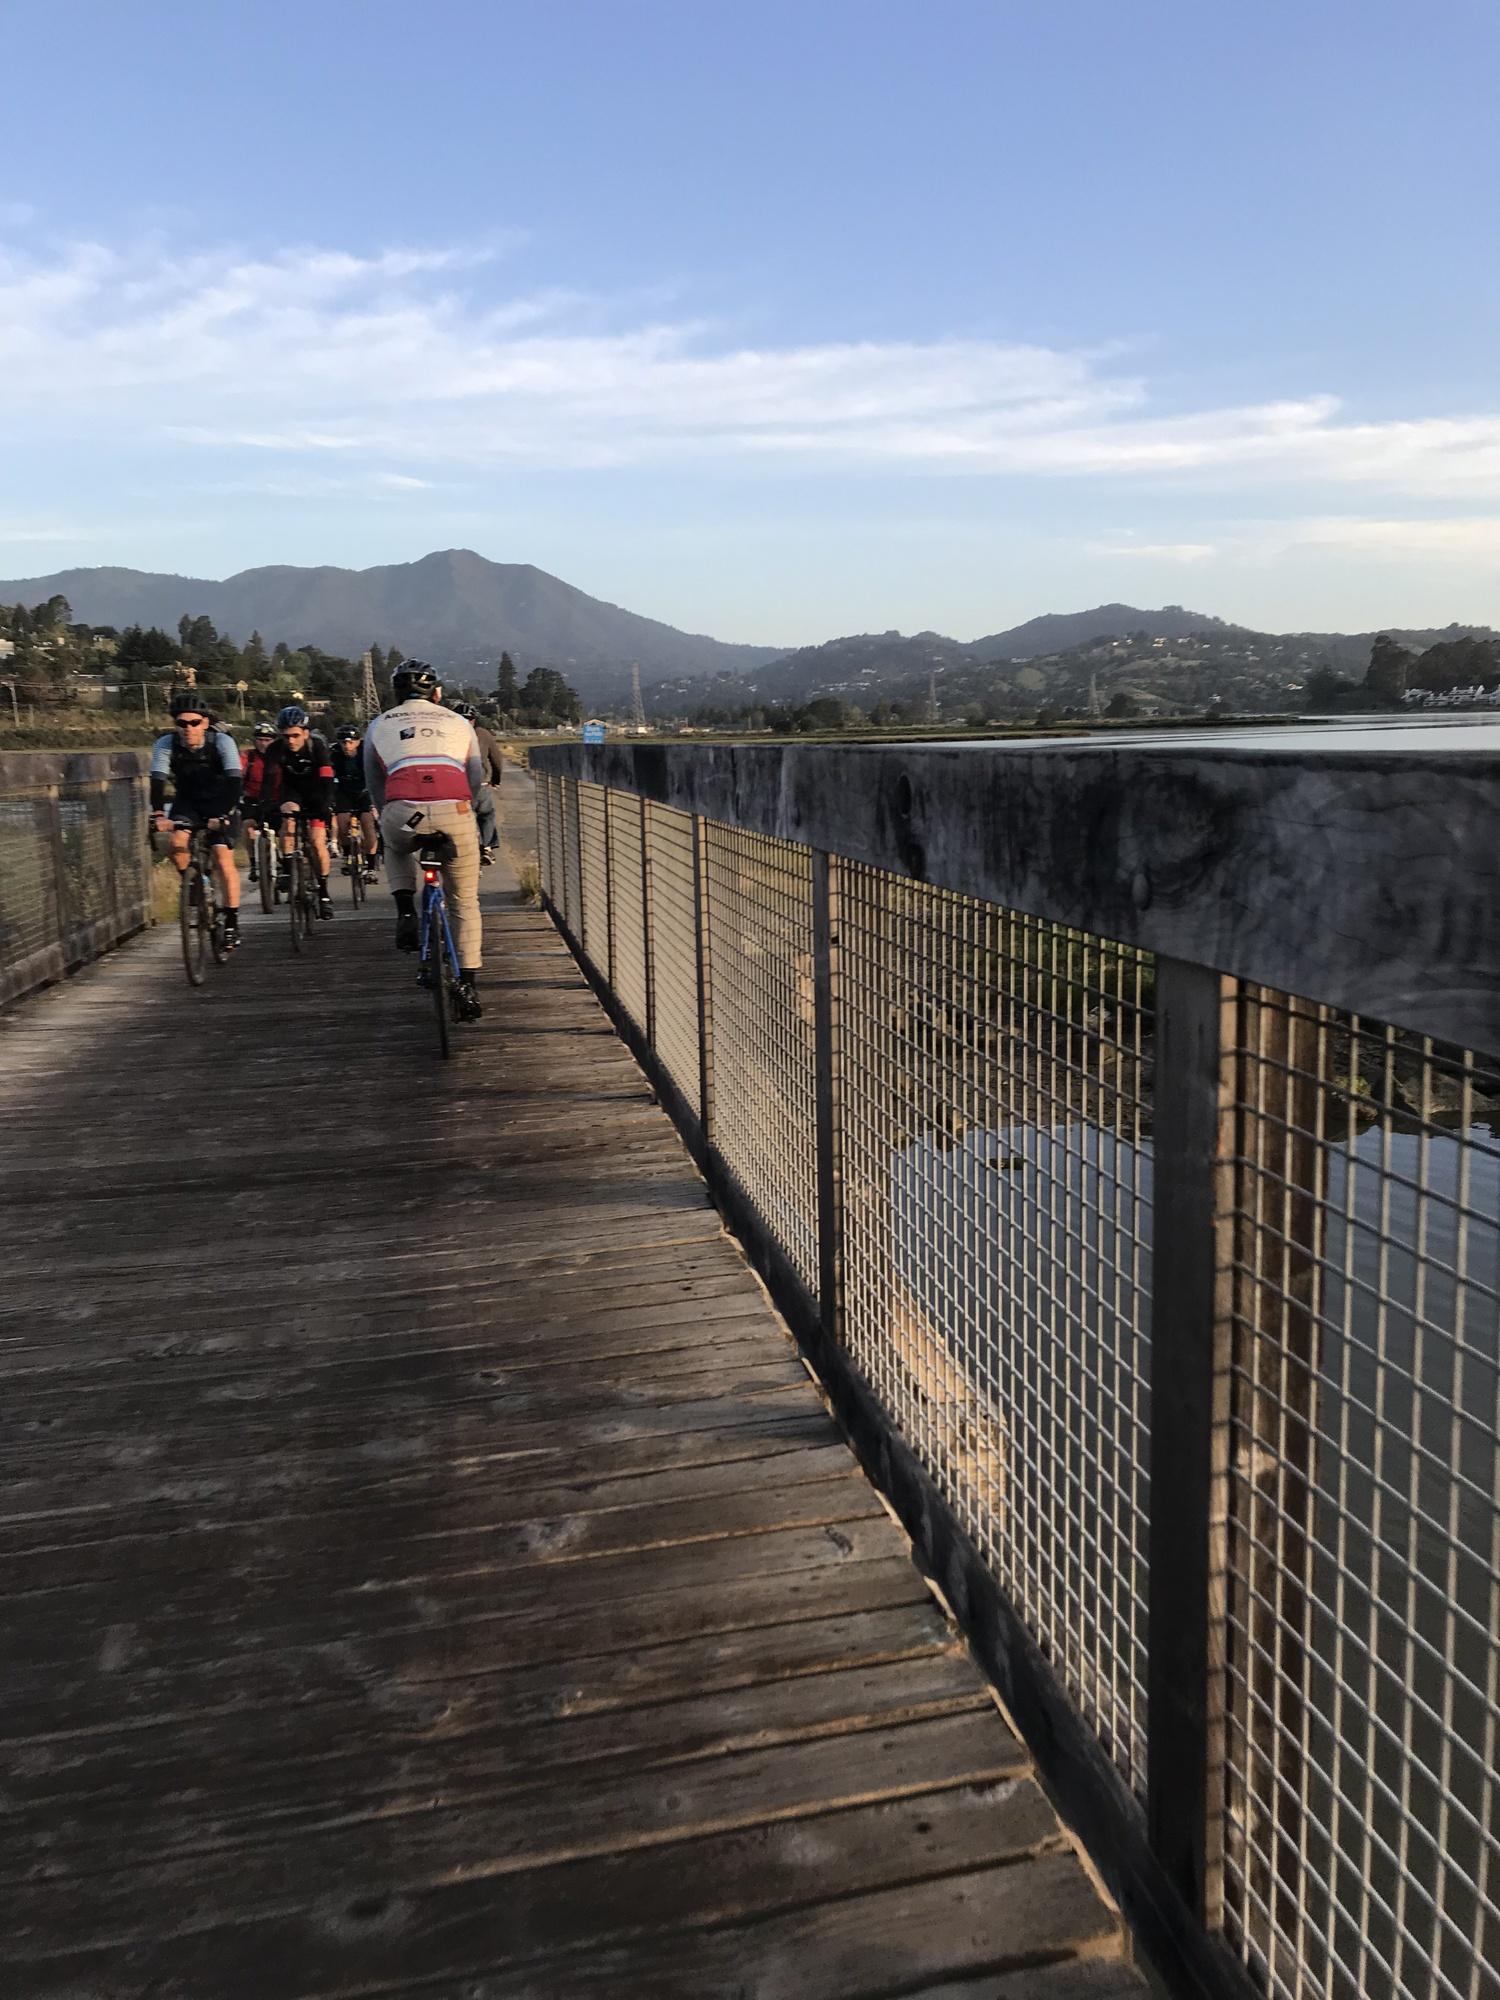 Lorenzo Cordova riding the Sausalito Multi-Use Path with Mt. Tam in the foreground